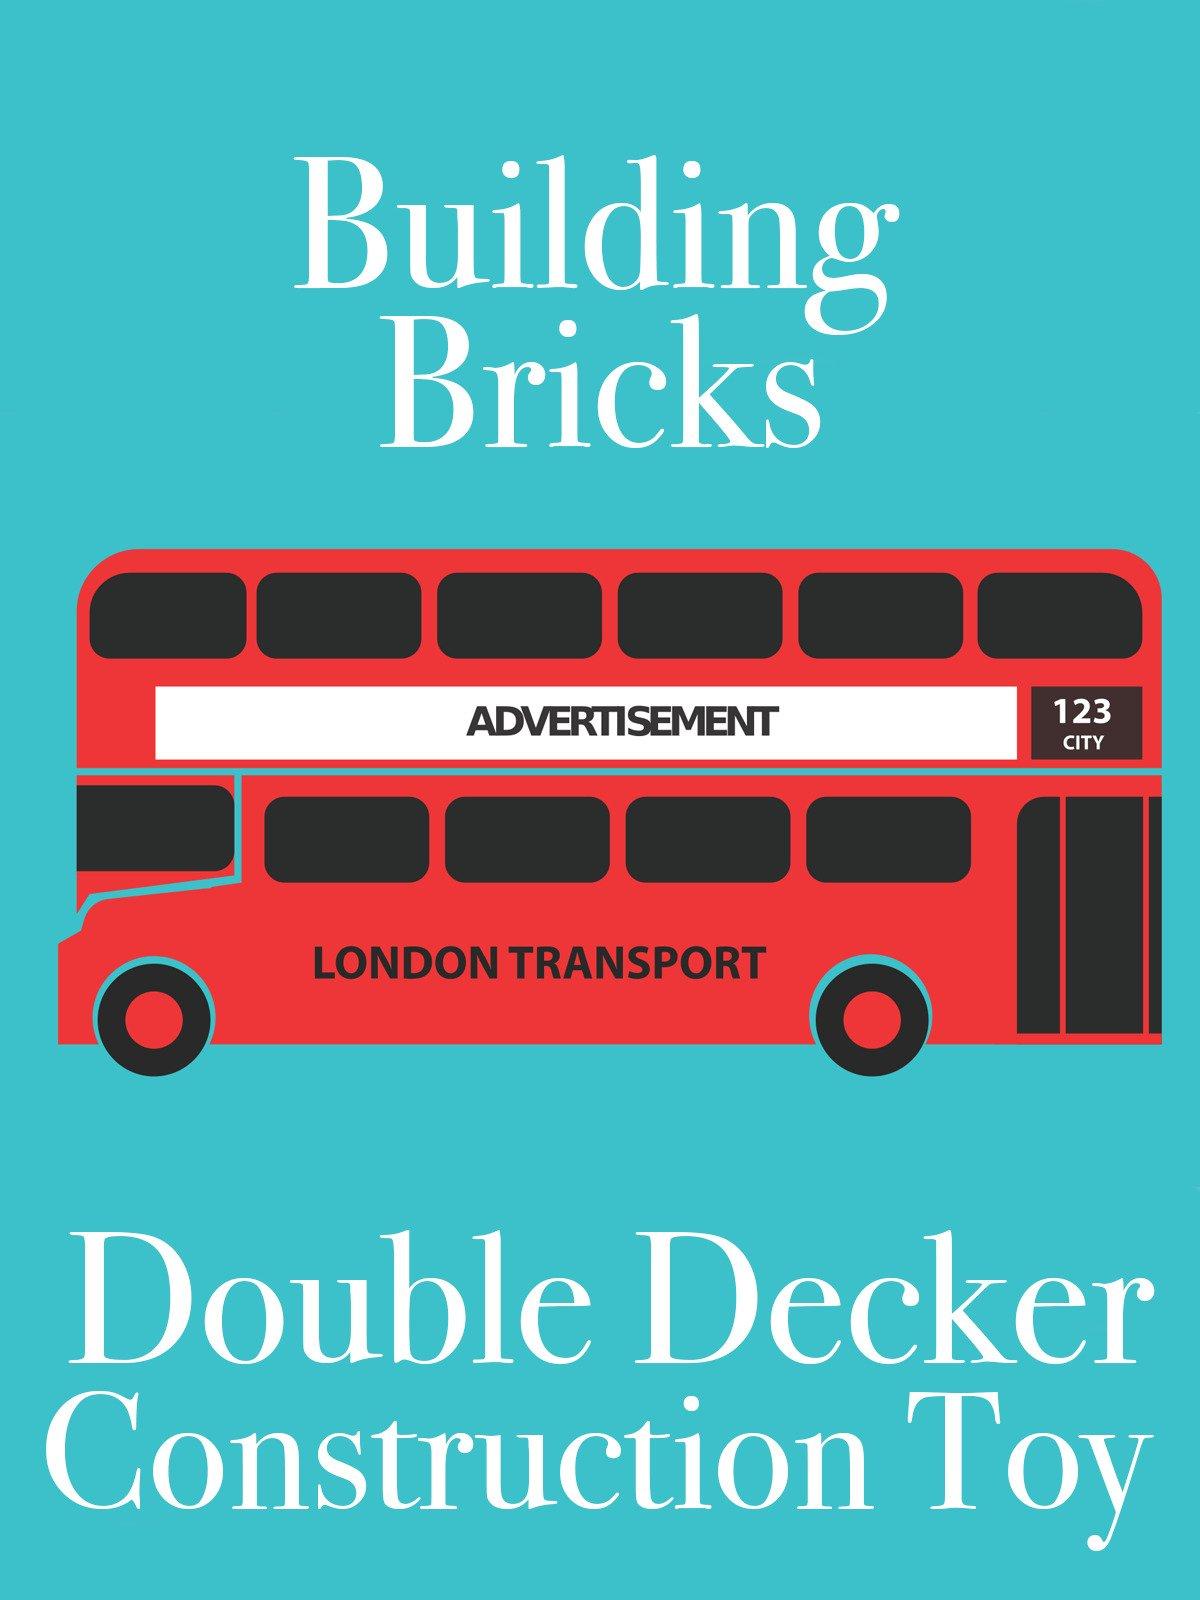 Clip: Building Bricks Double Decker Construction Toy